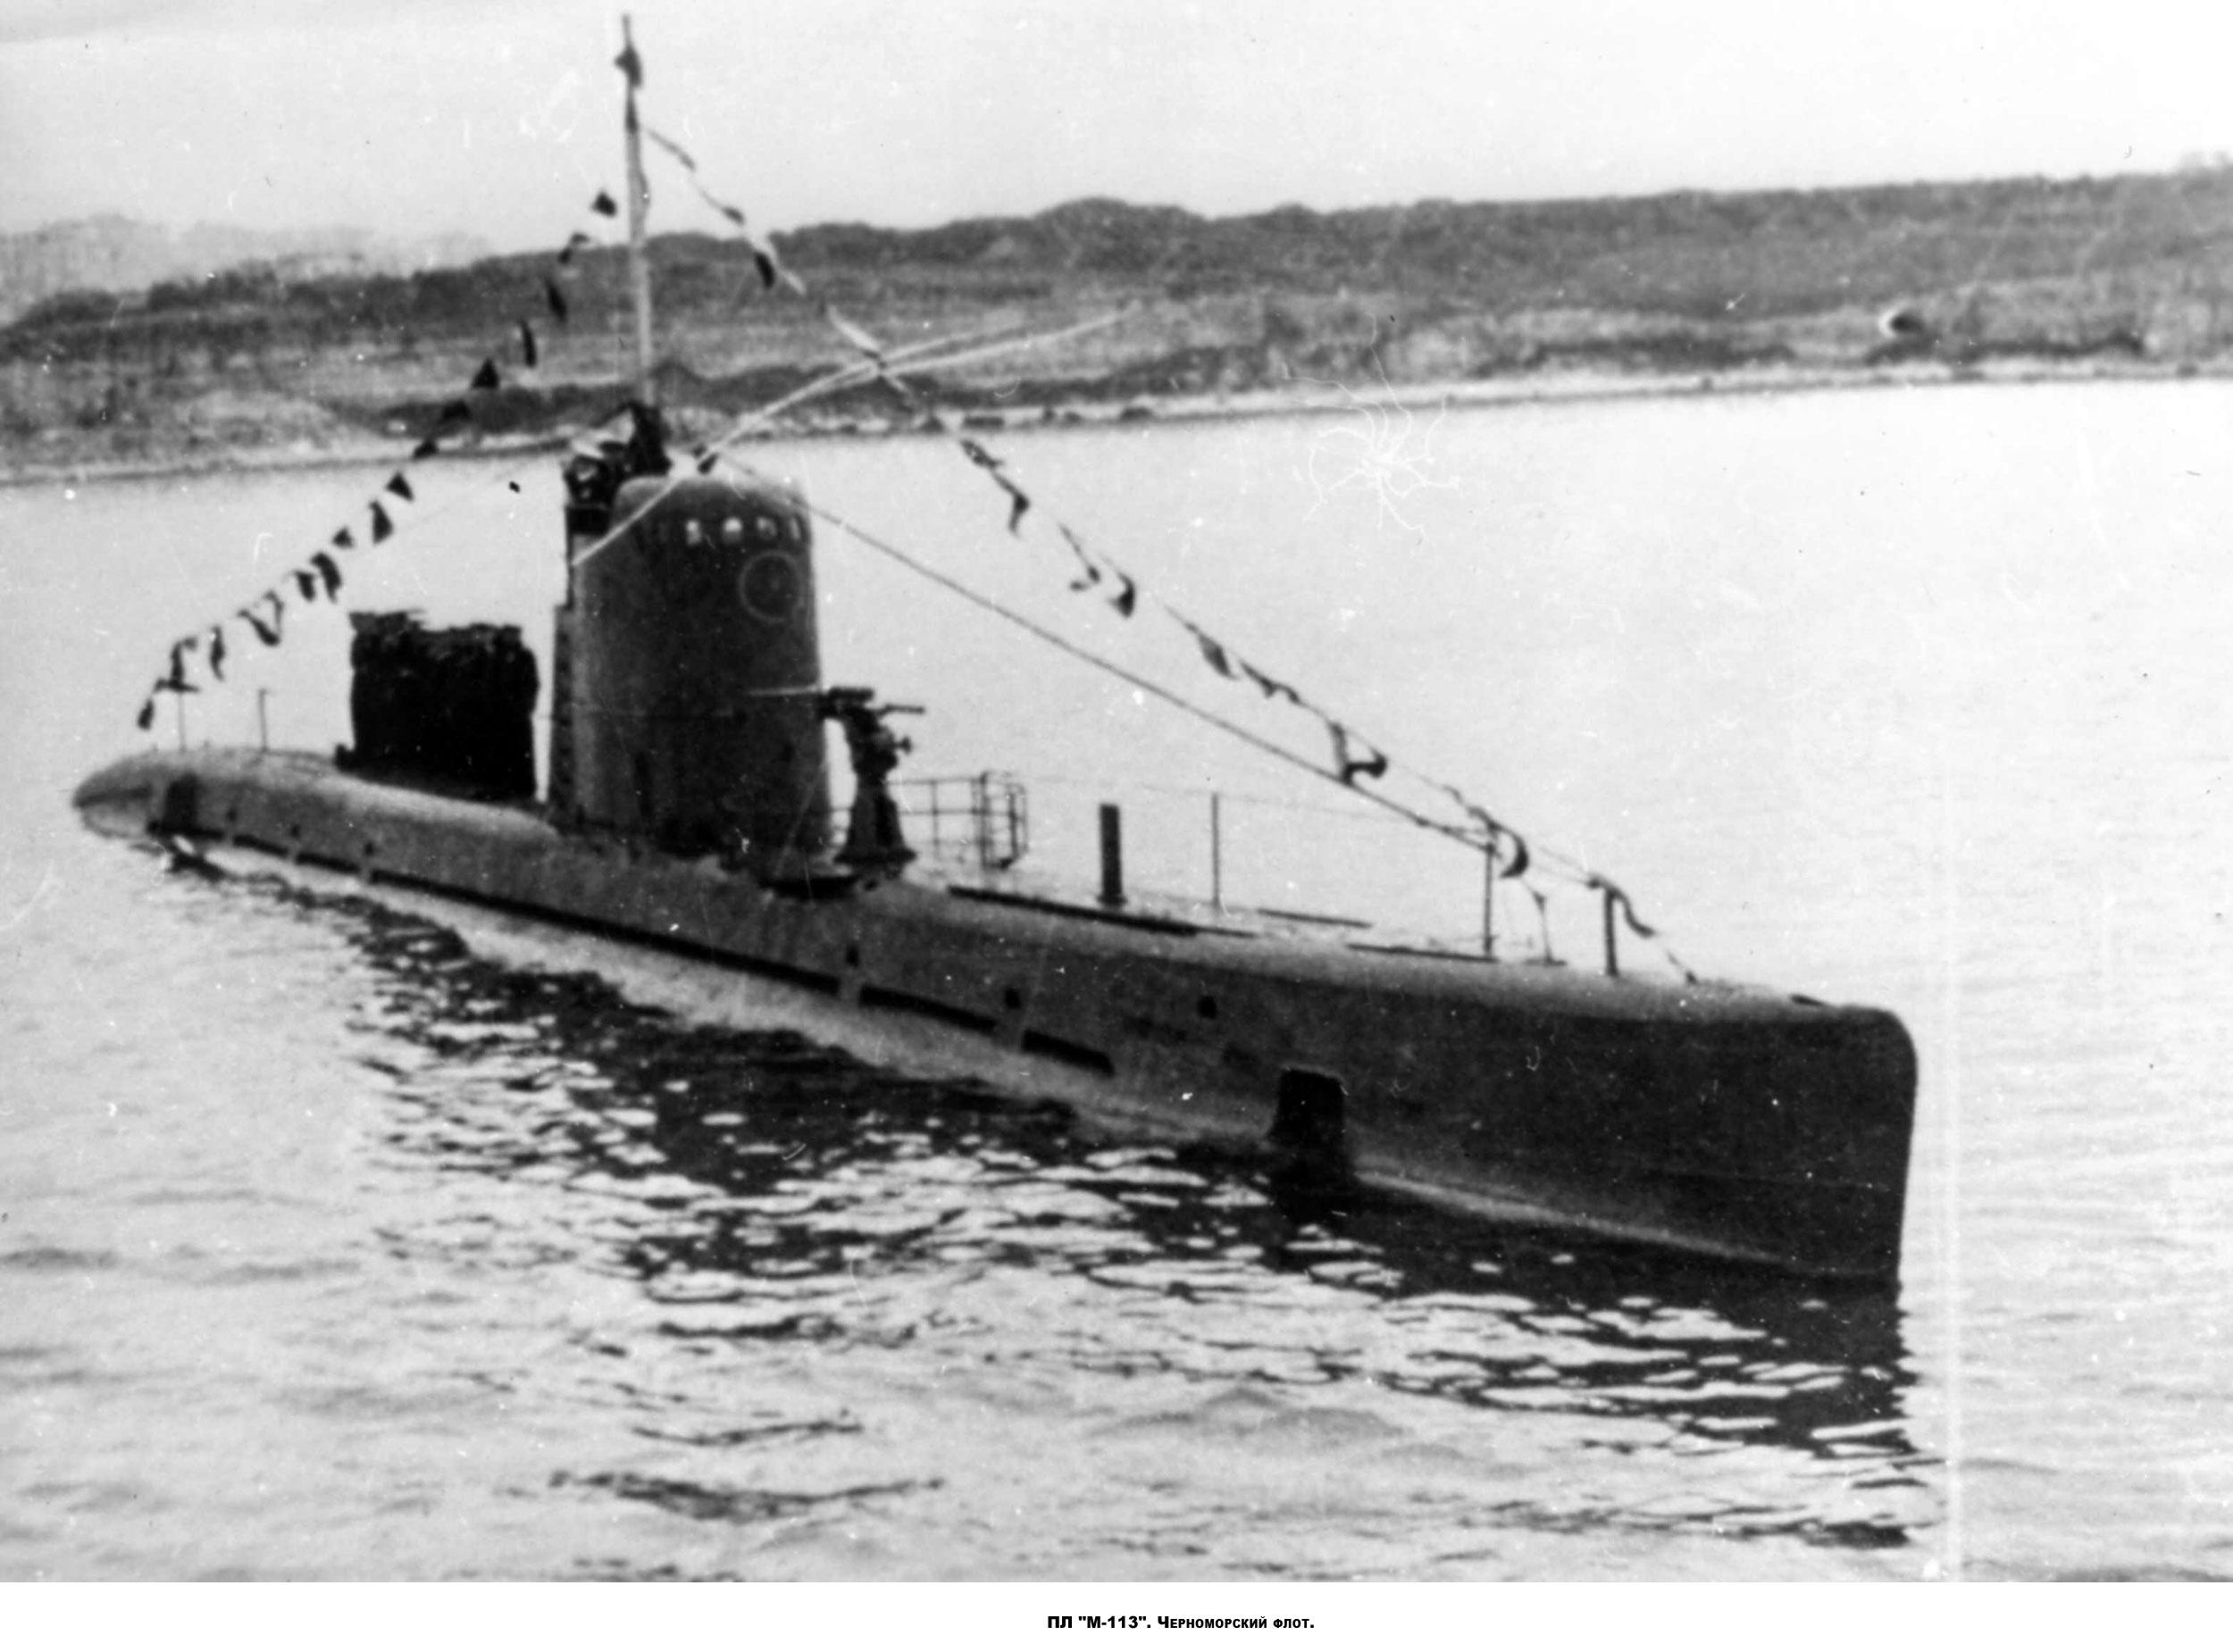 http://www.navy.su/navysub191745/m_xii/images/m-113_00.jpg